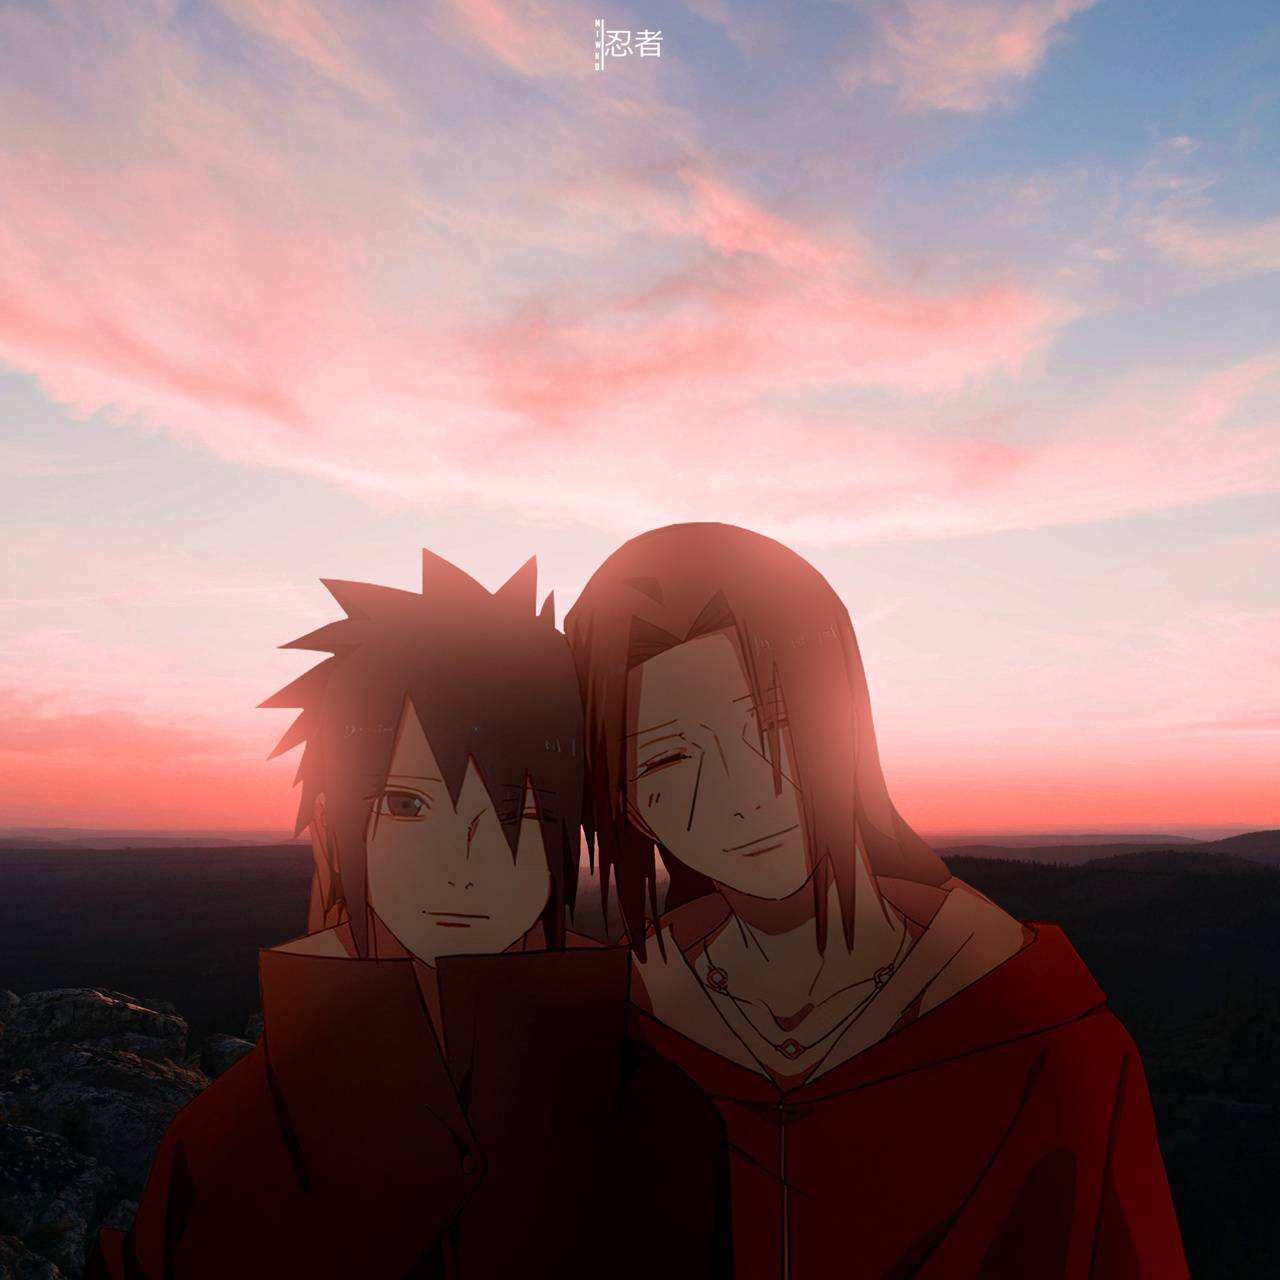 Sasuke x Itachi